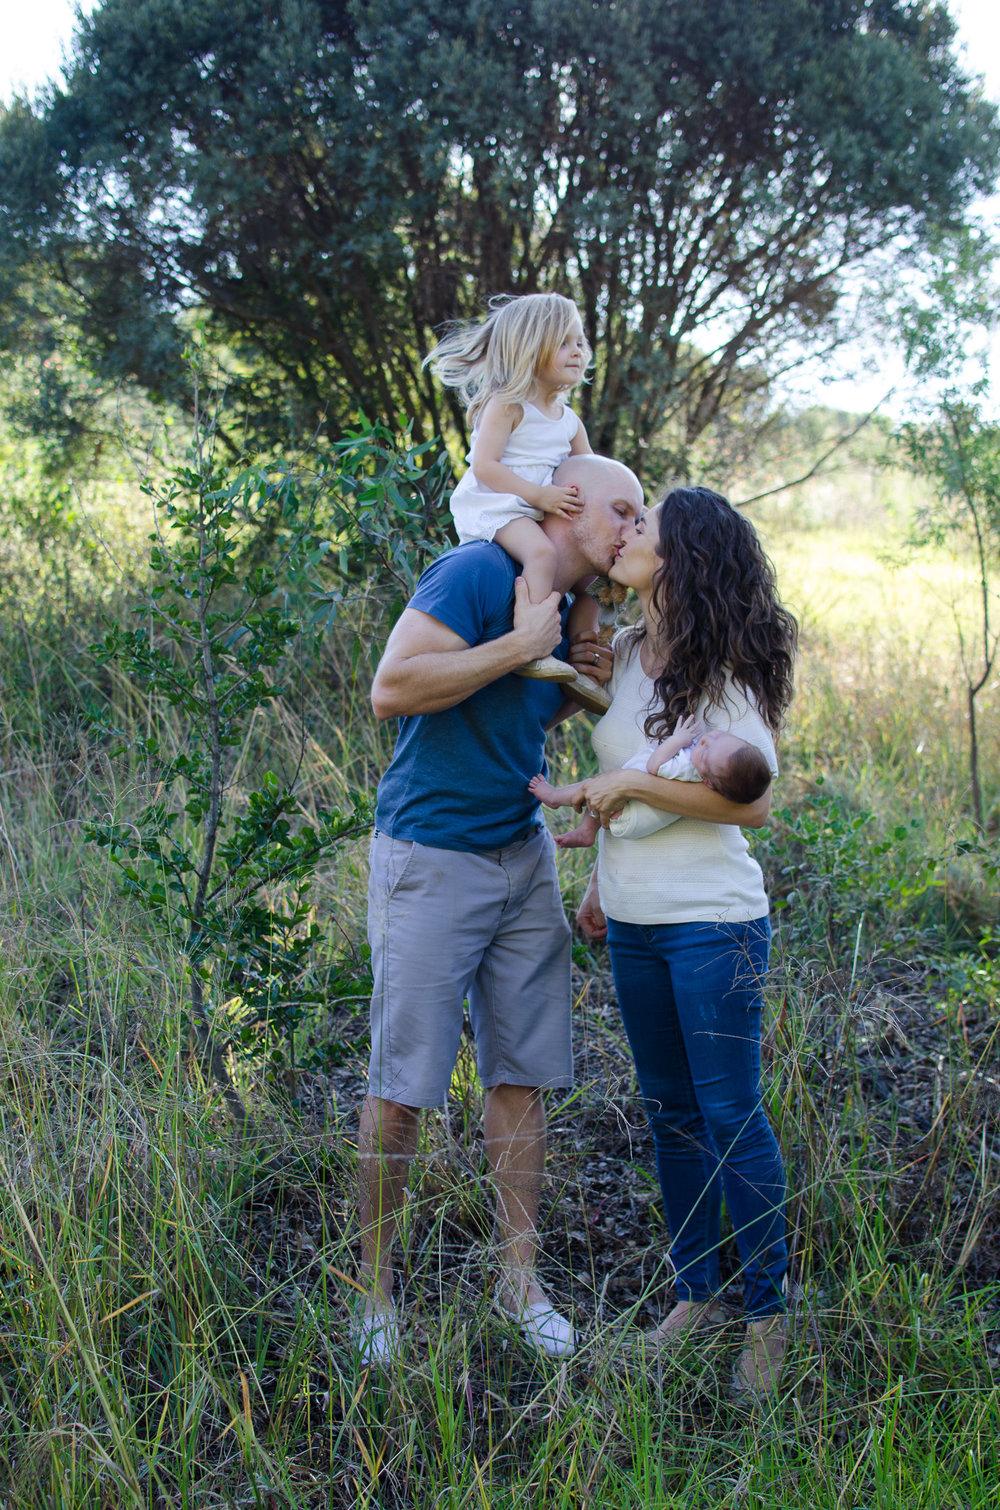 Newborn Lifestyle Photography   Johannesburg   Atkinson Family